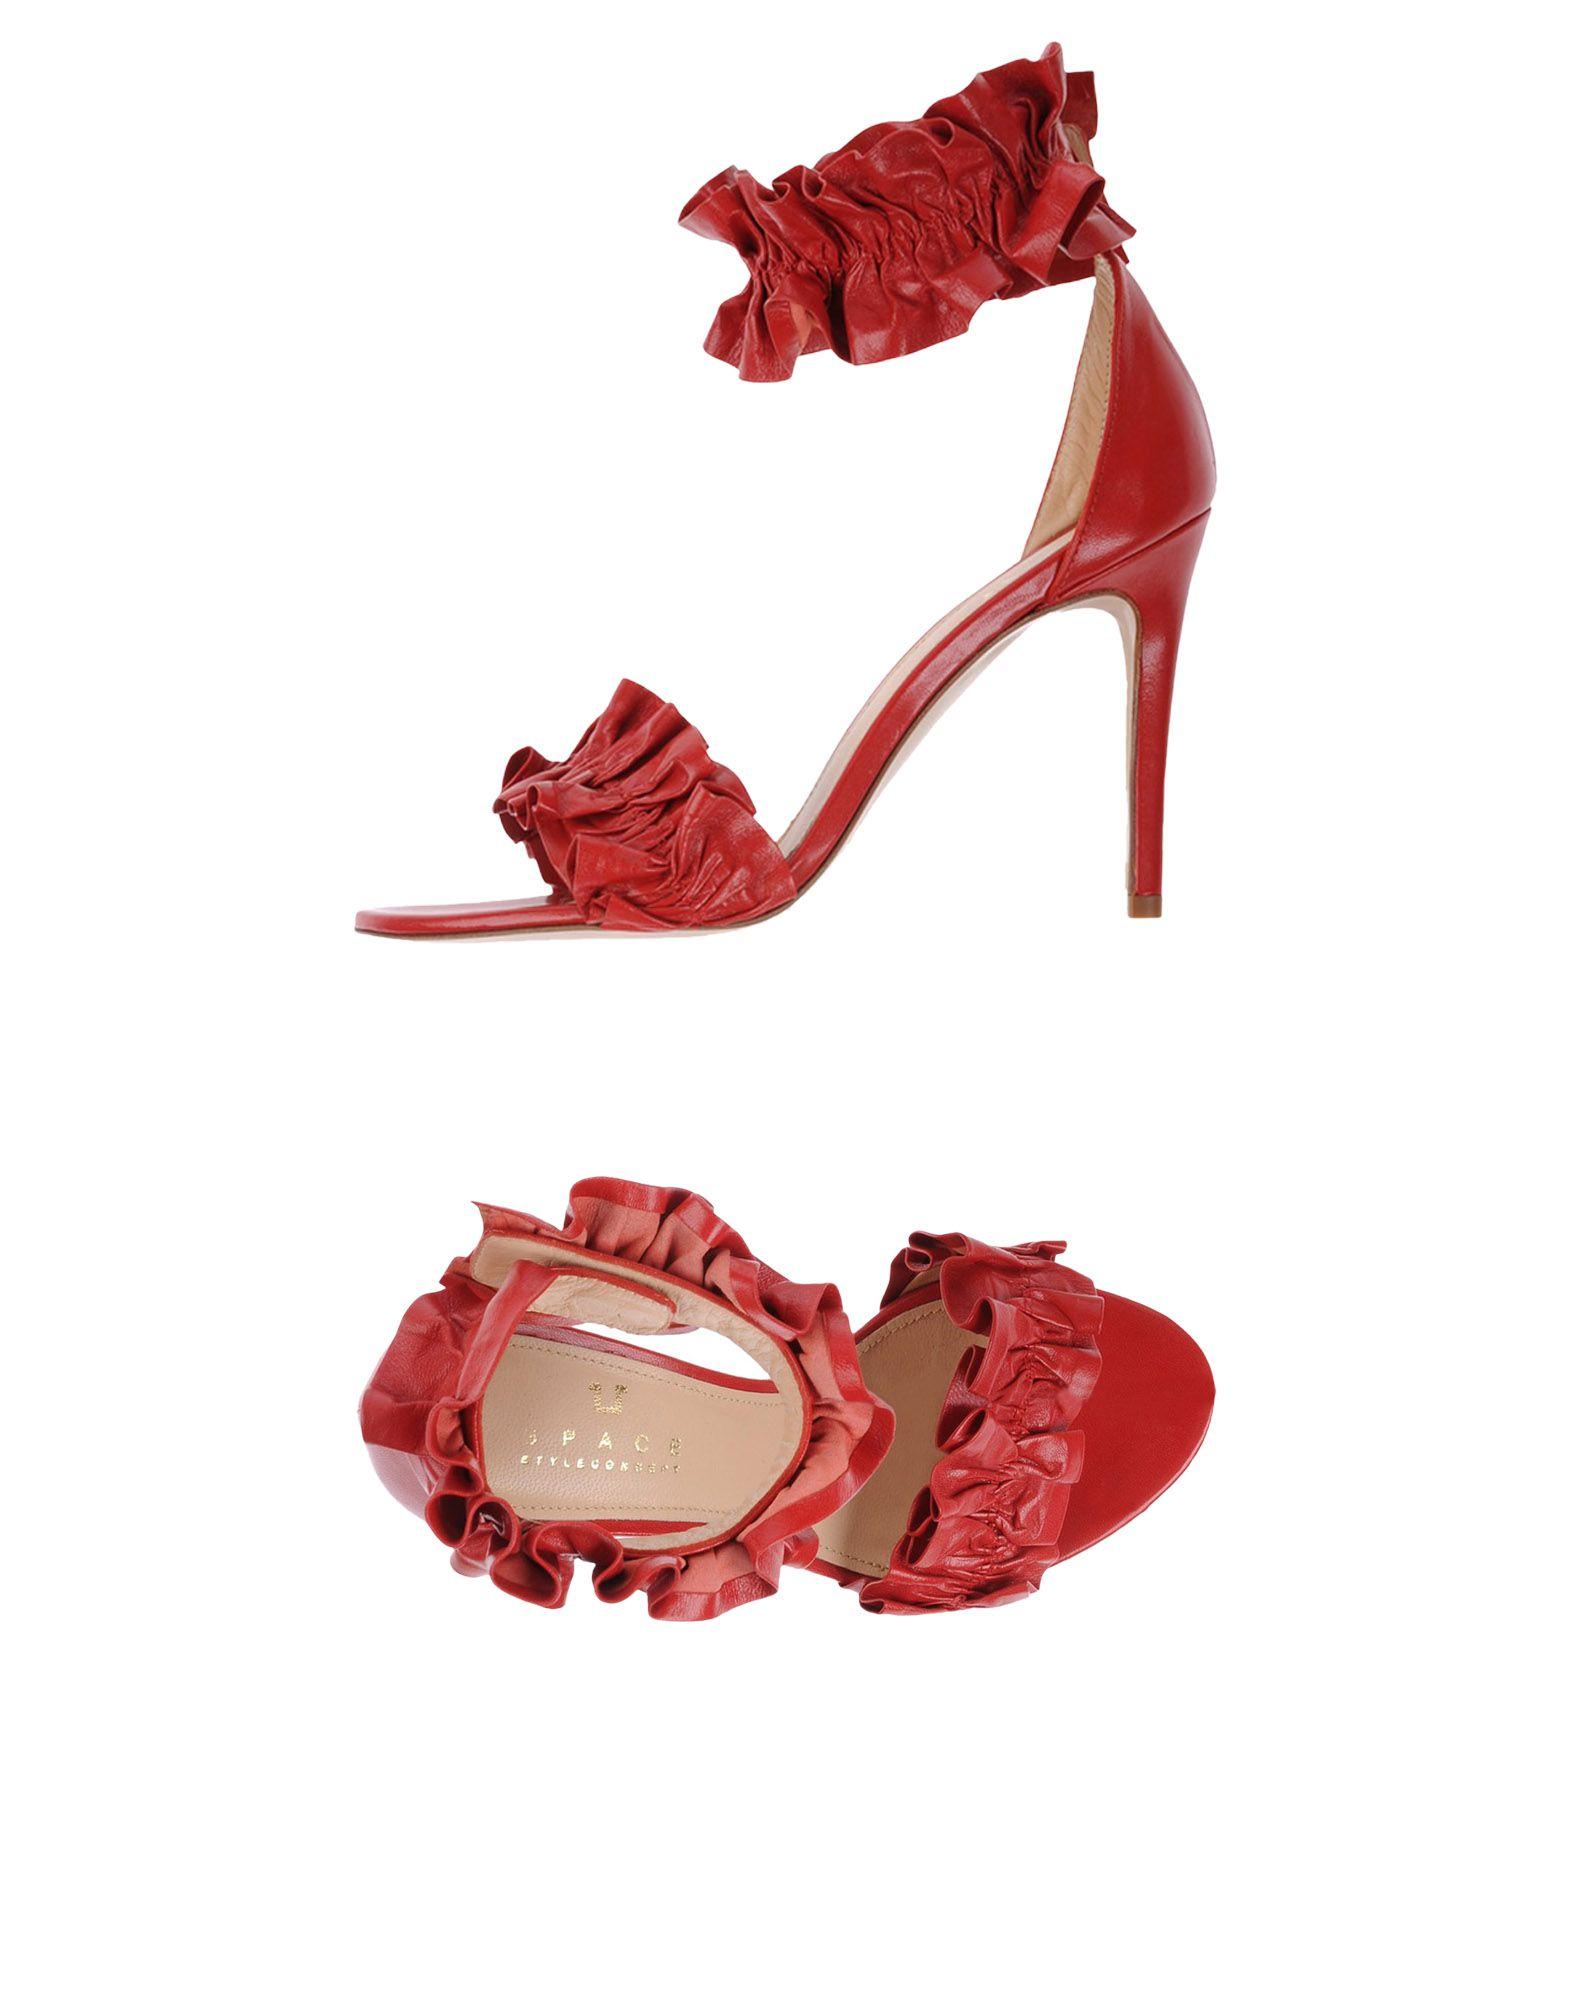 Rabatt Schuhe Damen Space Style Concept Sandalen Damen Schuhe  11335882MF 980db9